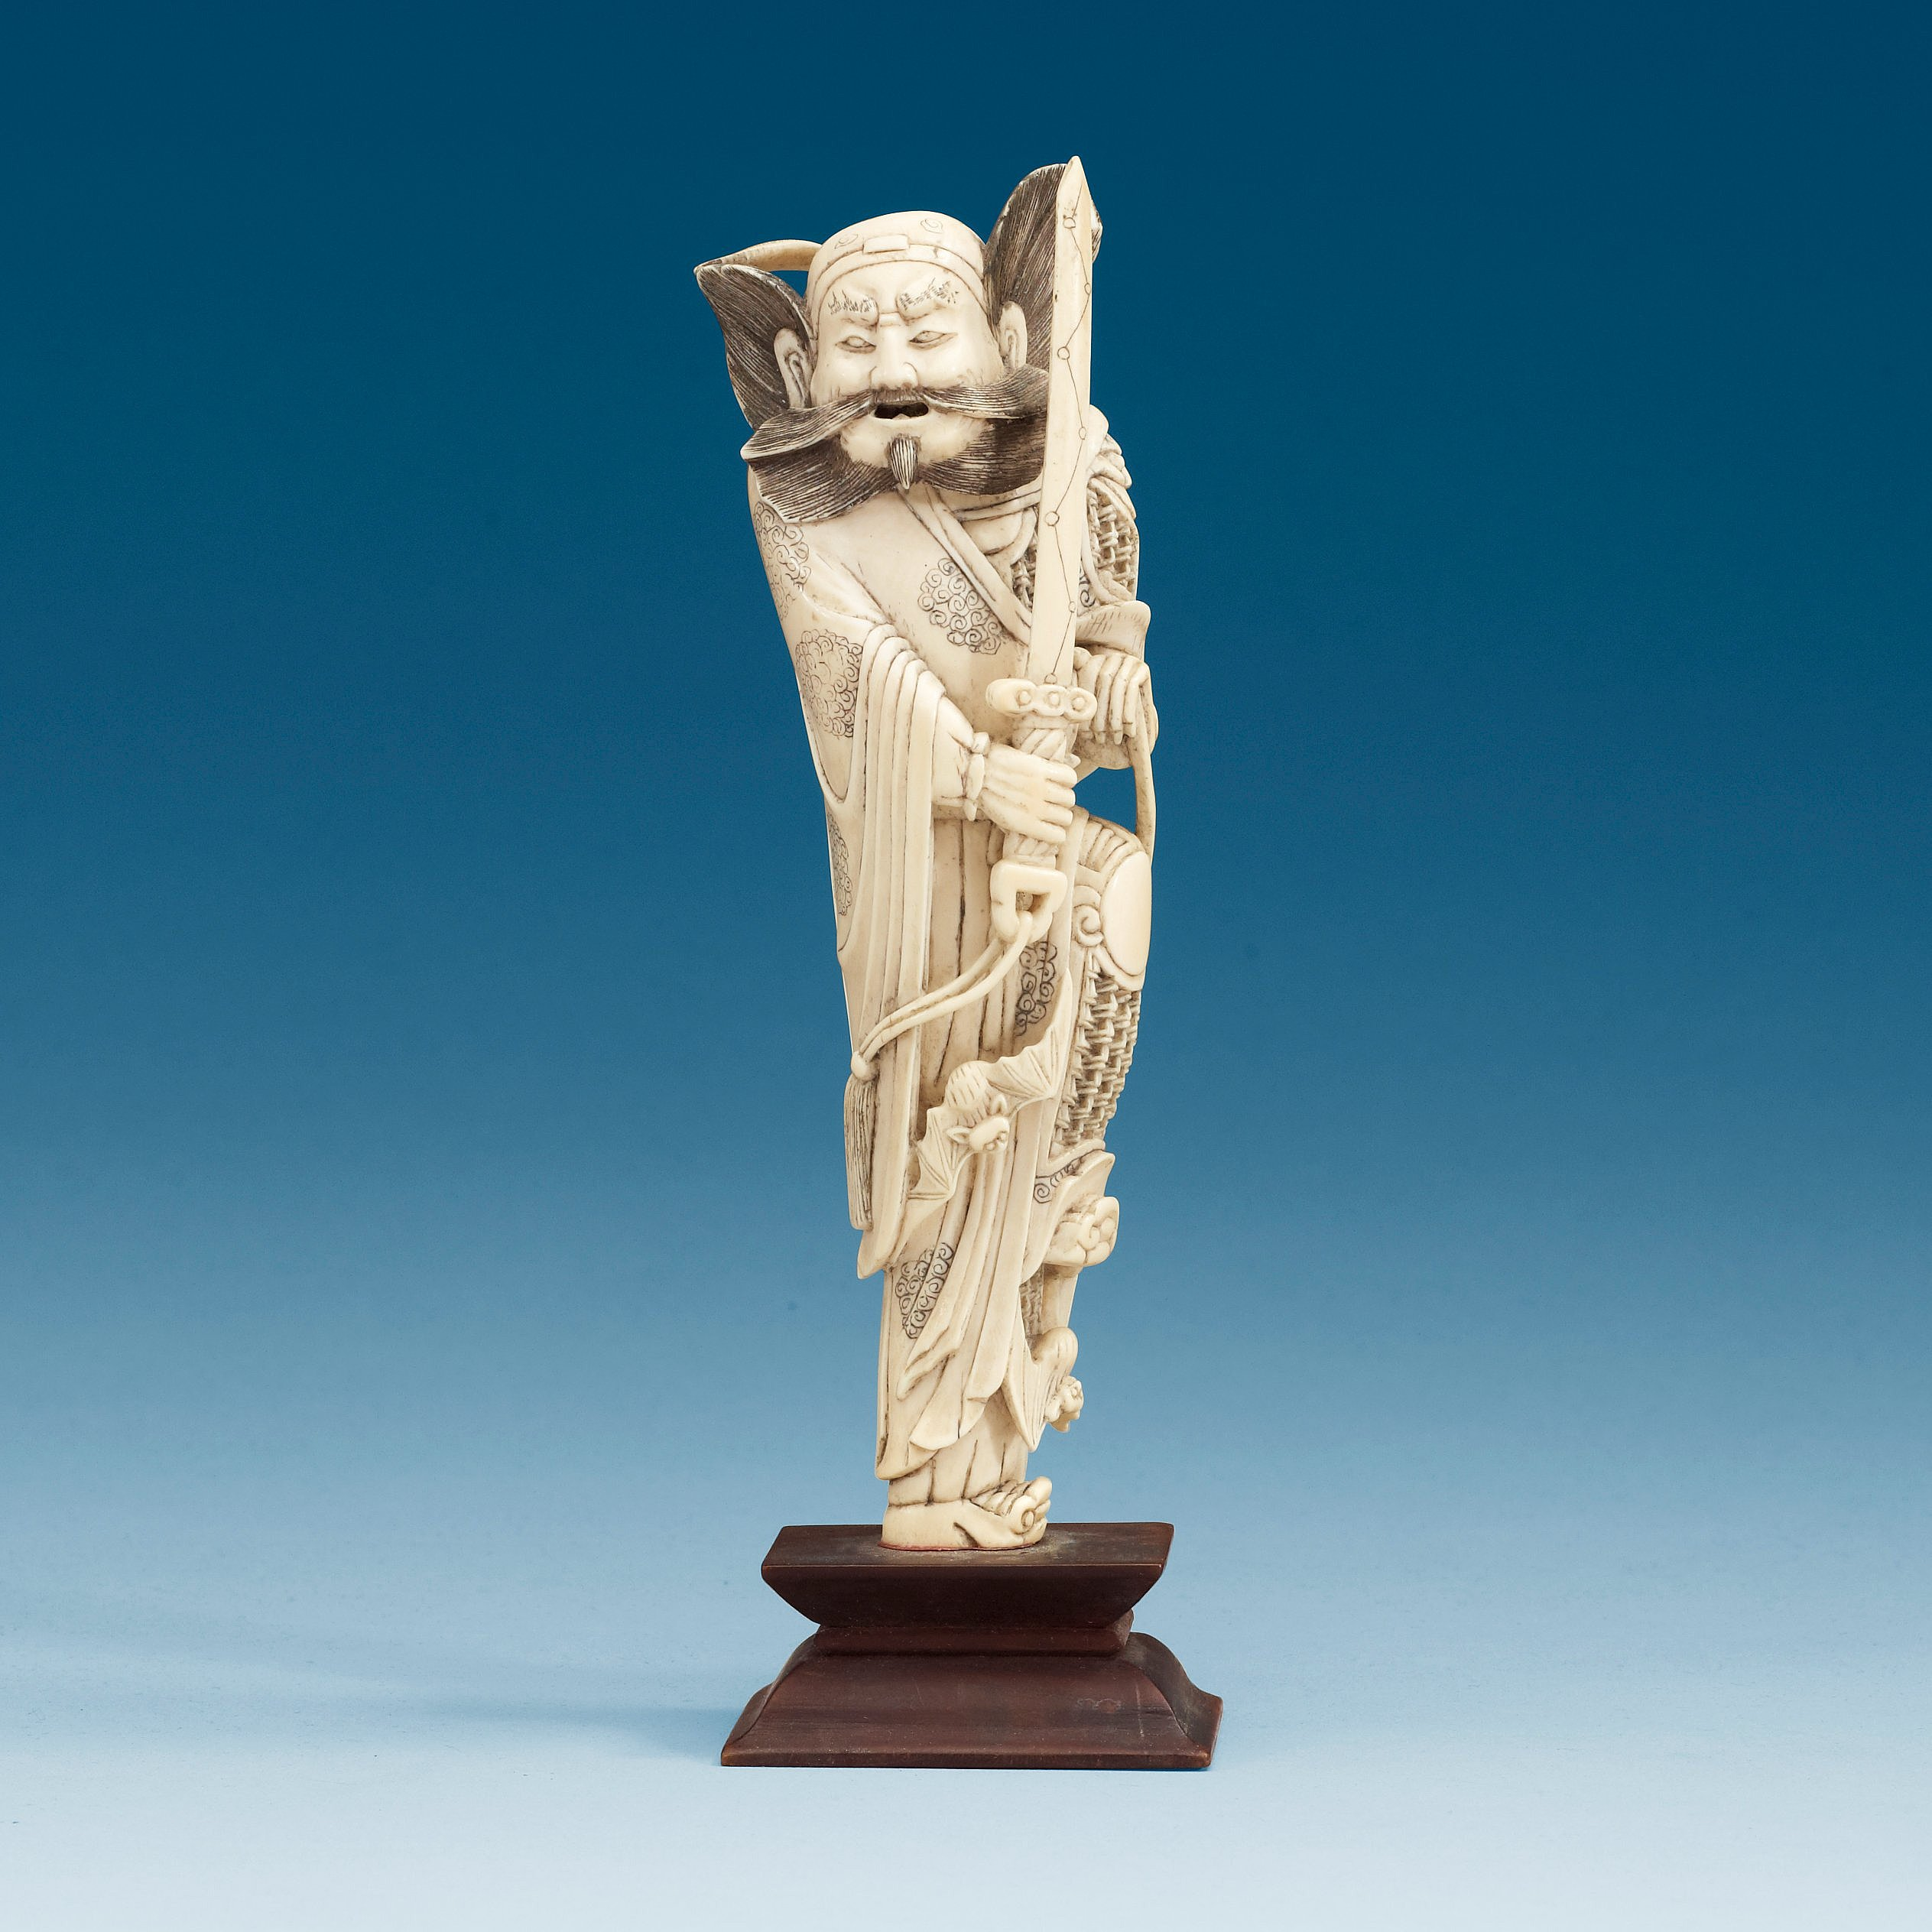 e9d1e56db An carved ivory sculpture of a guardsman